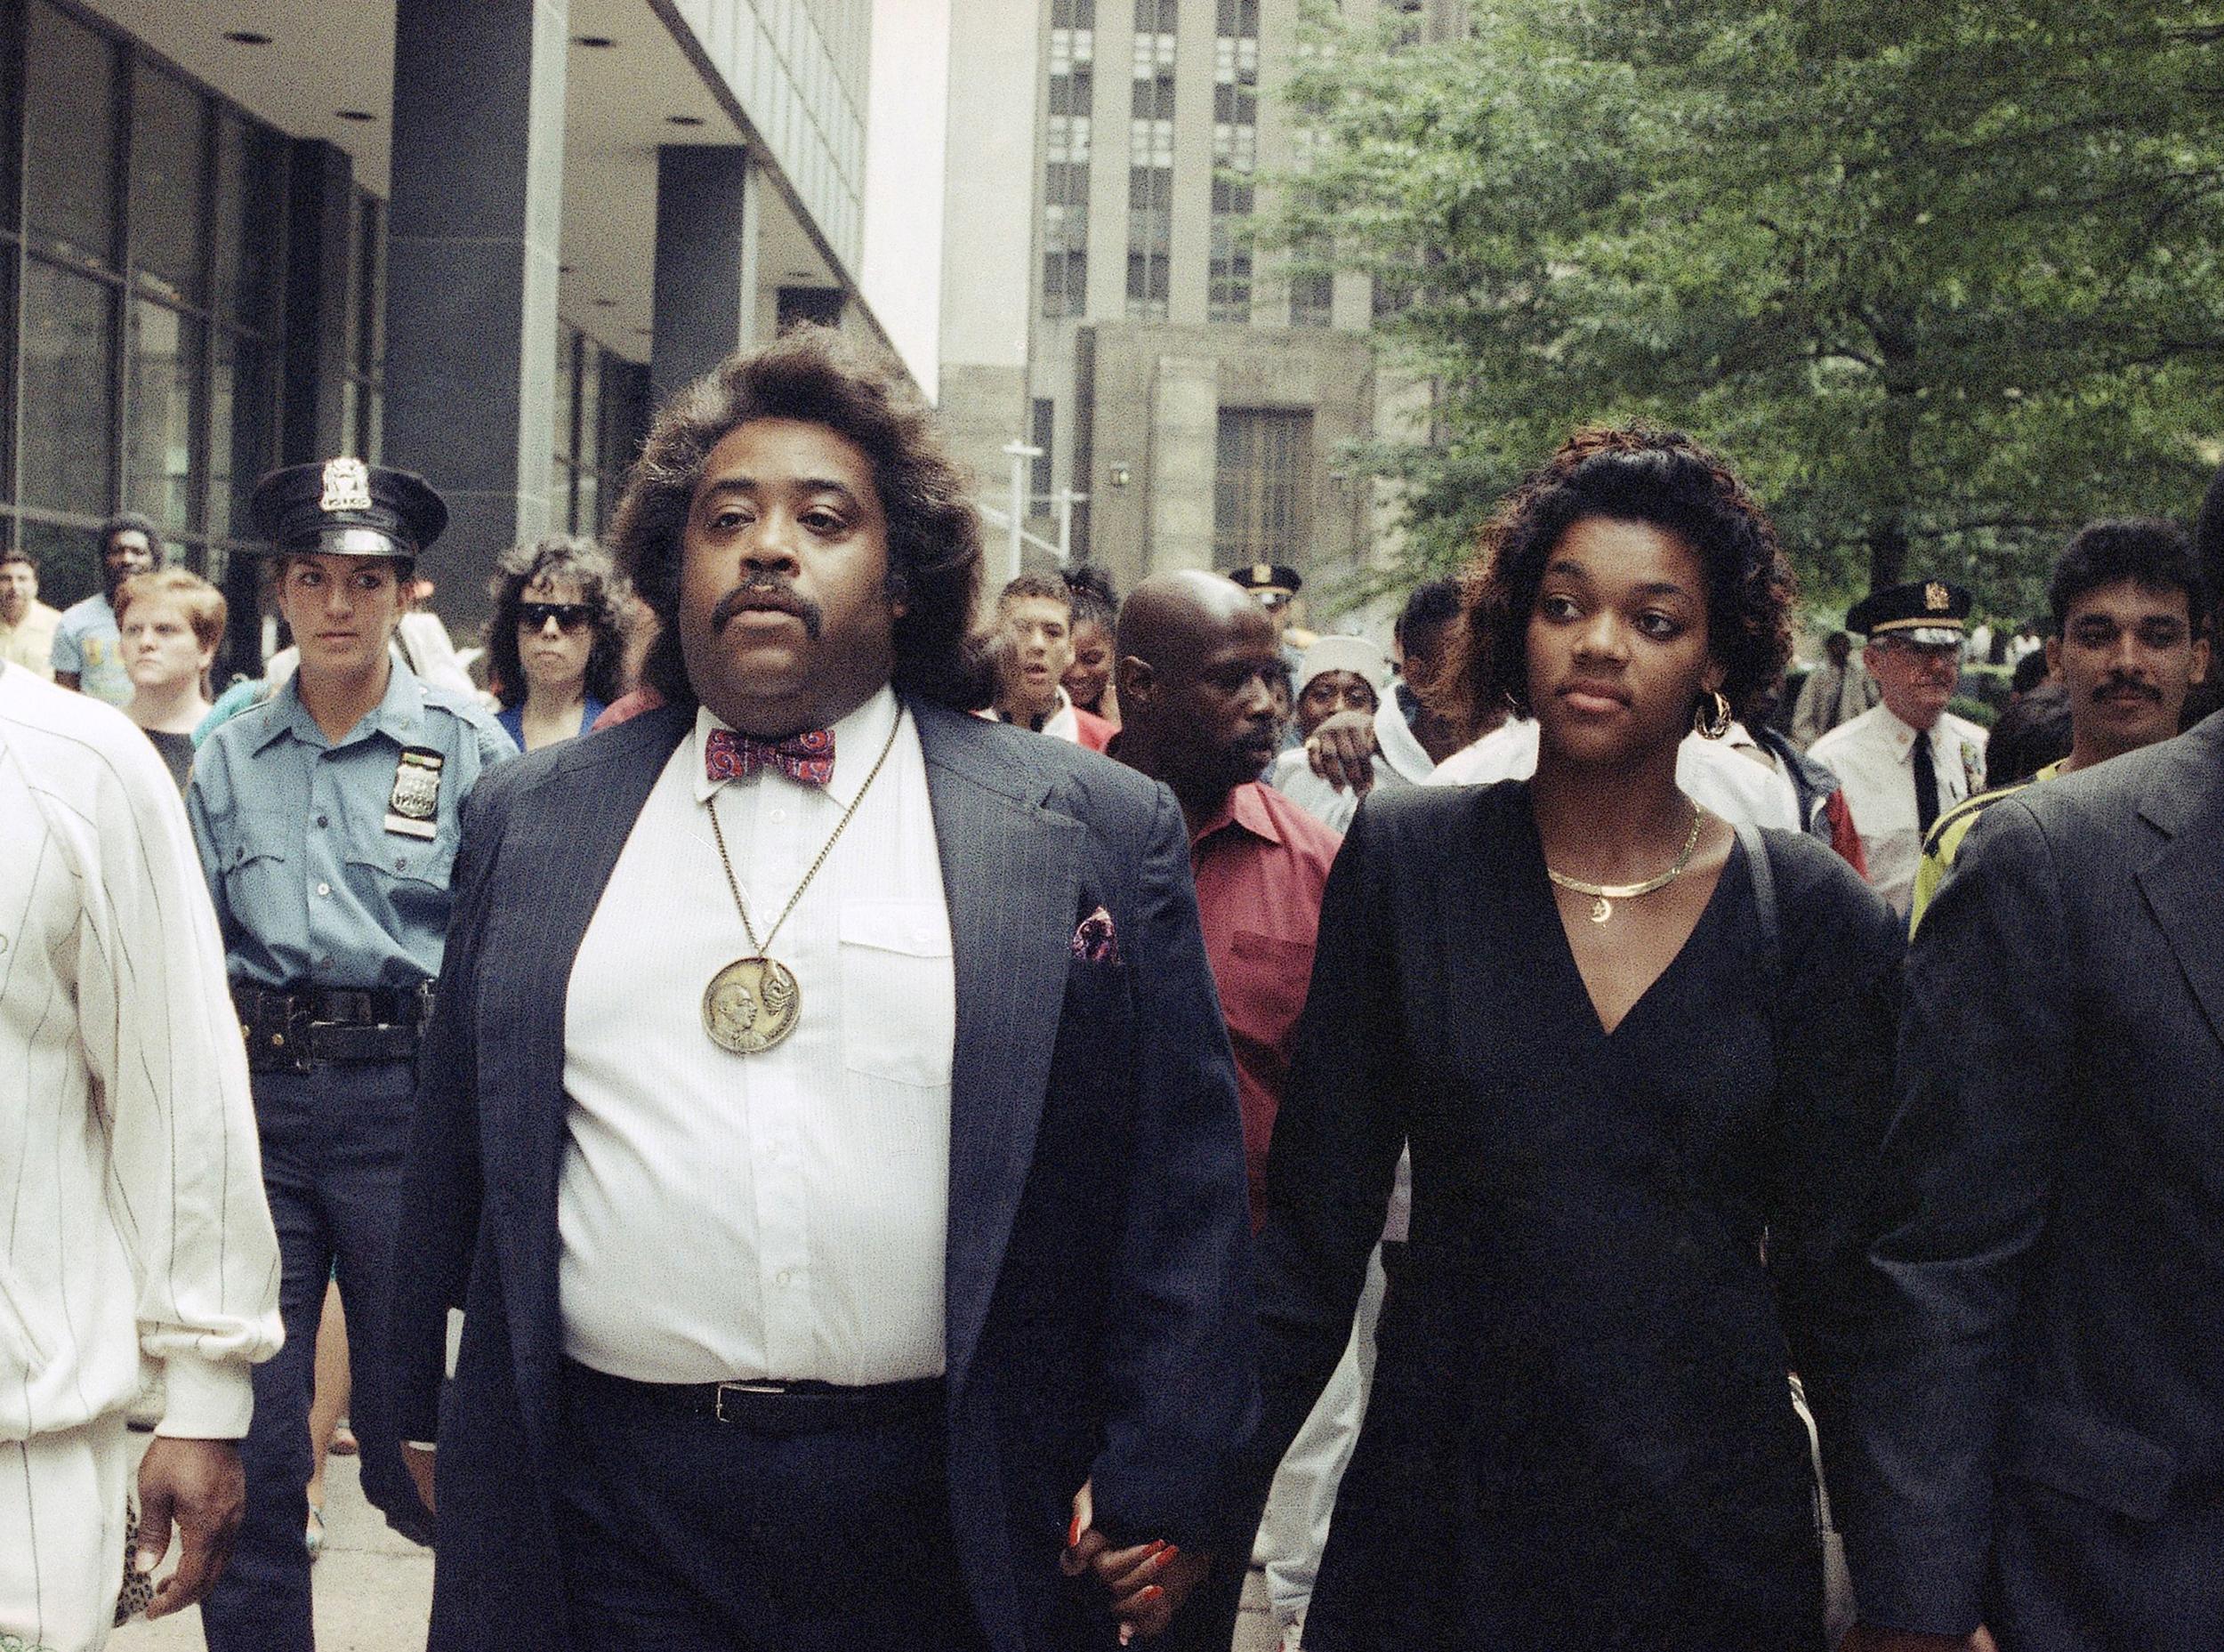 Image: Rev. Al Sharpton, left, and Tawana Brawley in 1990